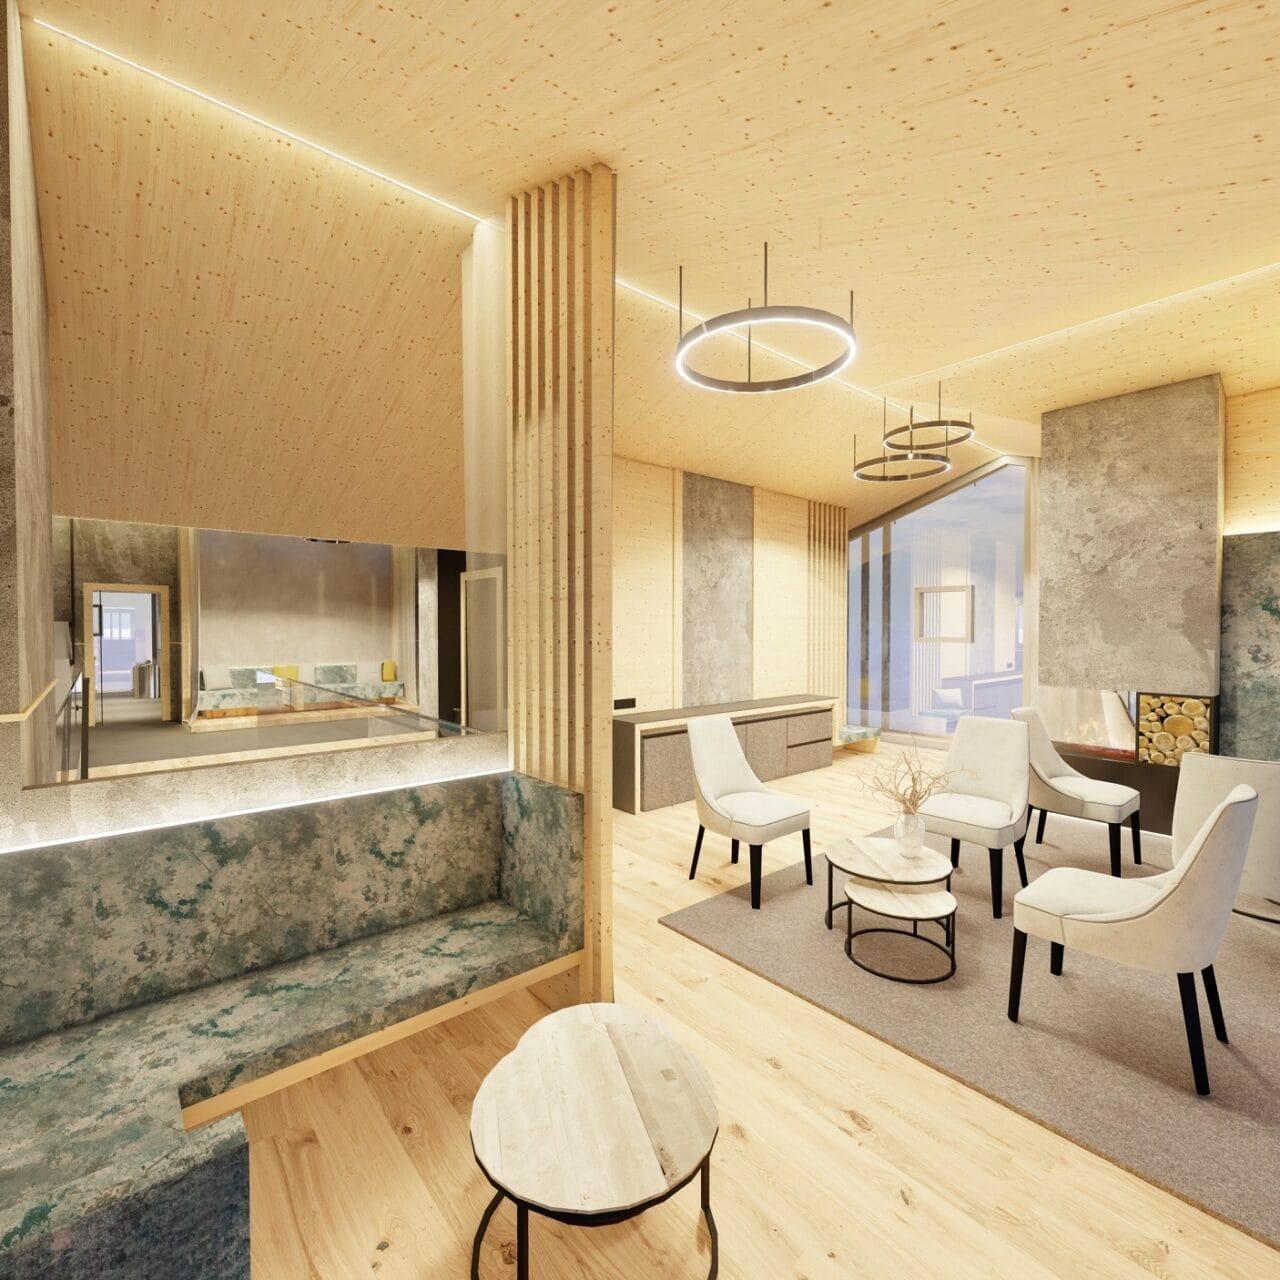 hofgut-apartment-lifestyle-resort-erlebenimhofgut-pool-wellness-teekueche-sauna